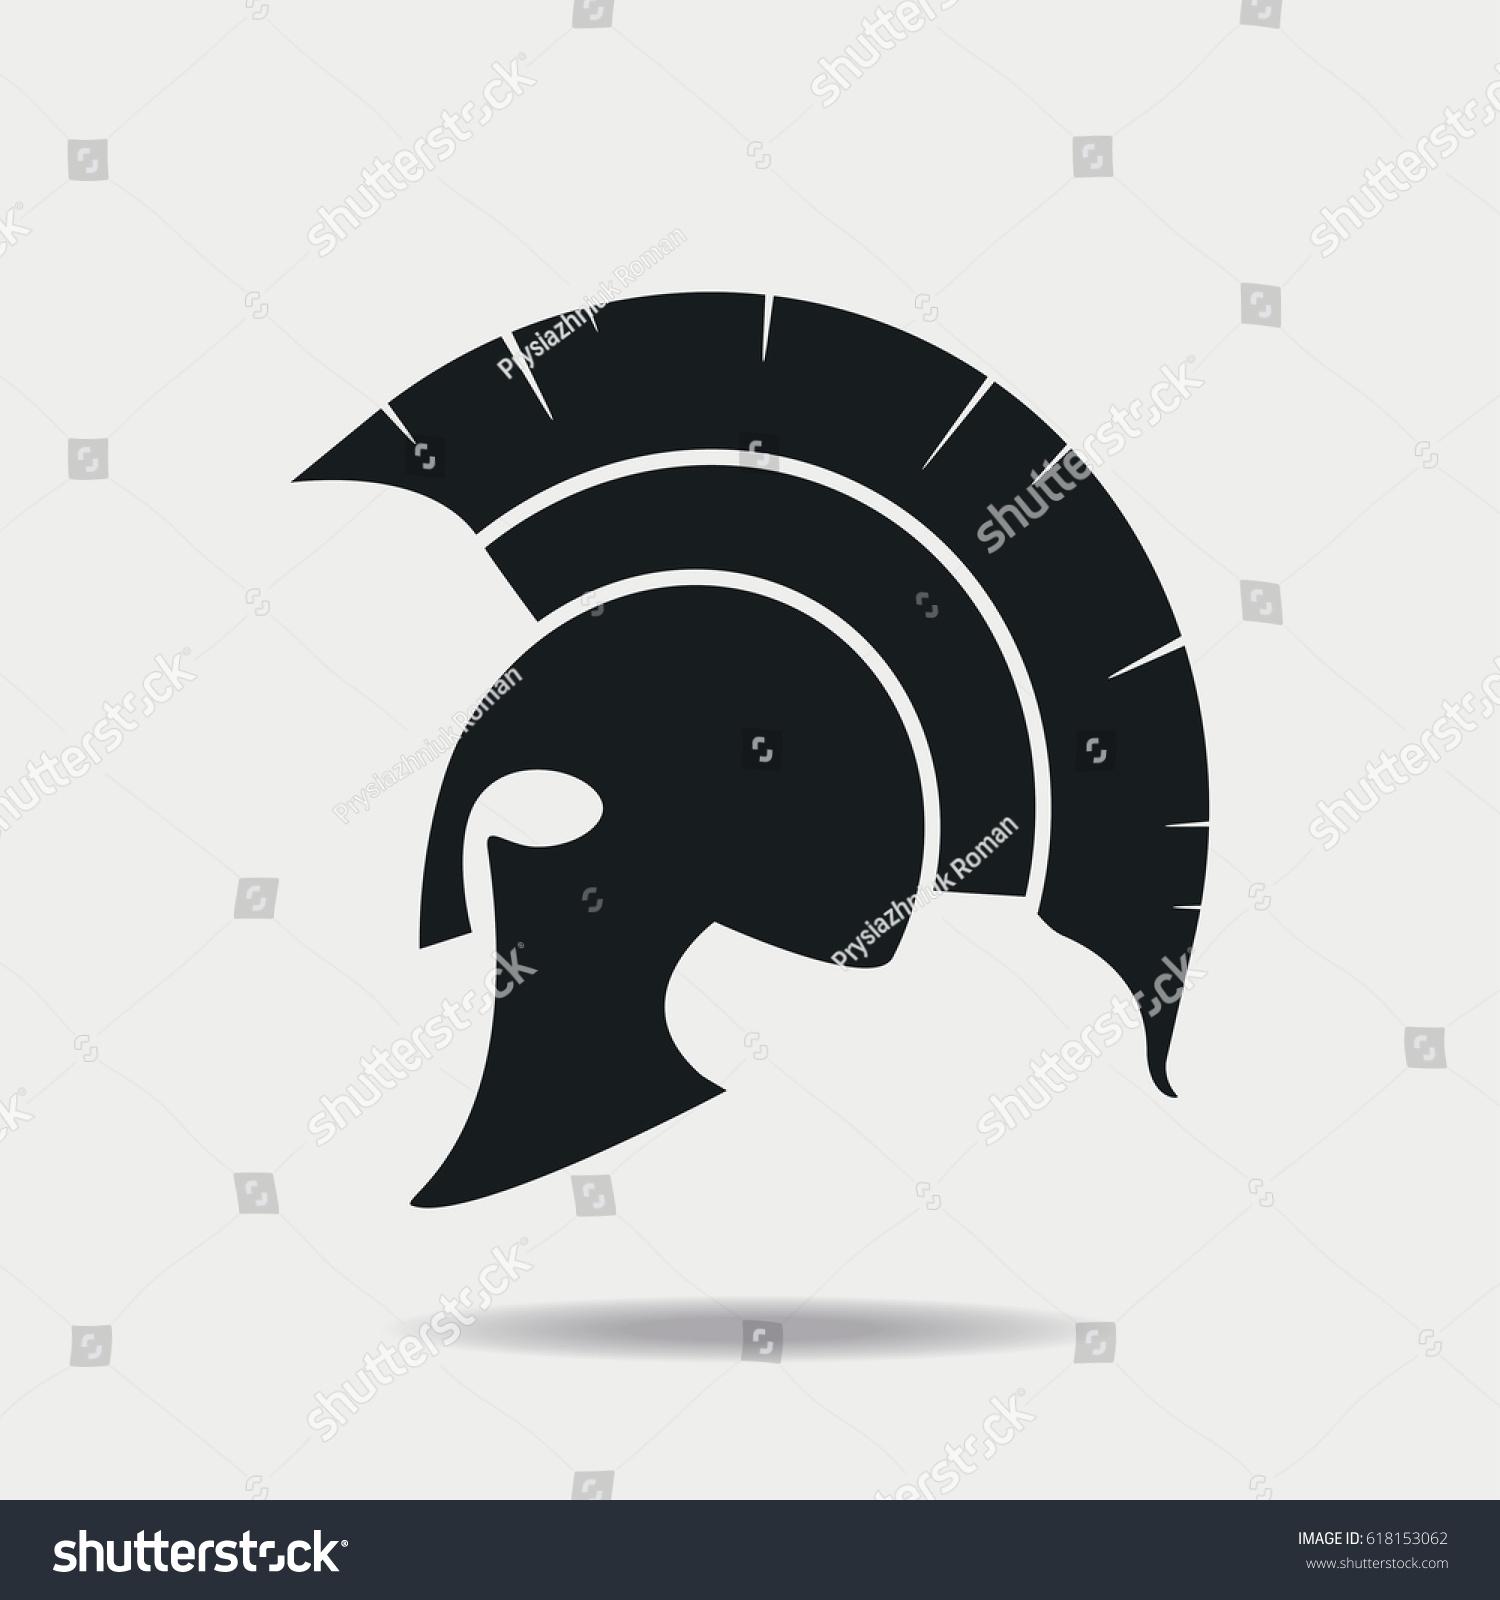 greek roman symbols images symbol and sign ideas